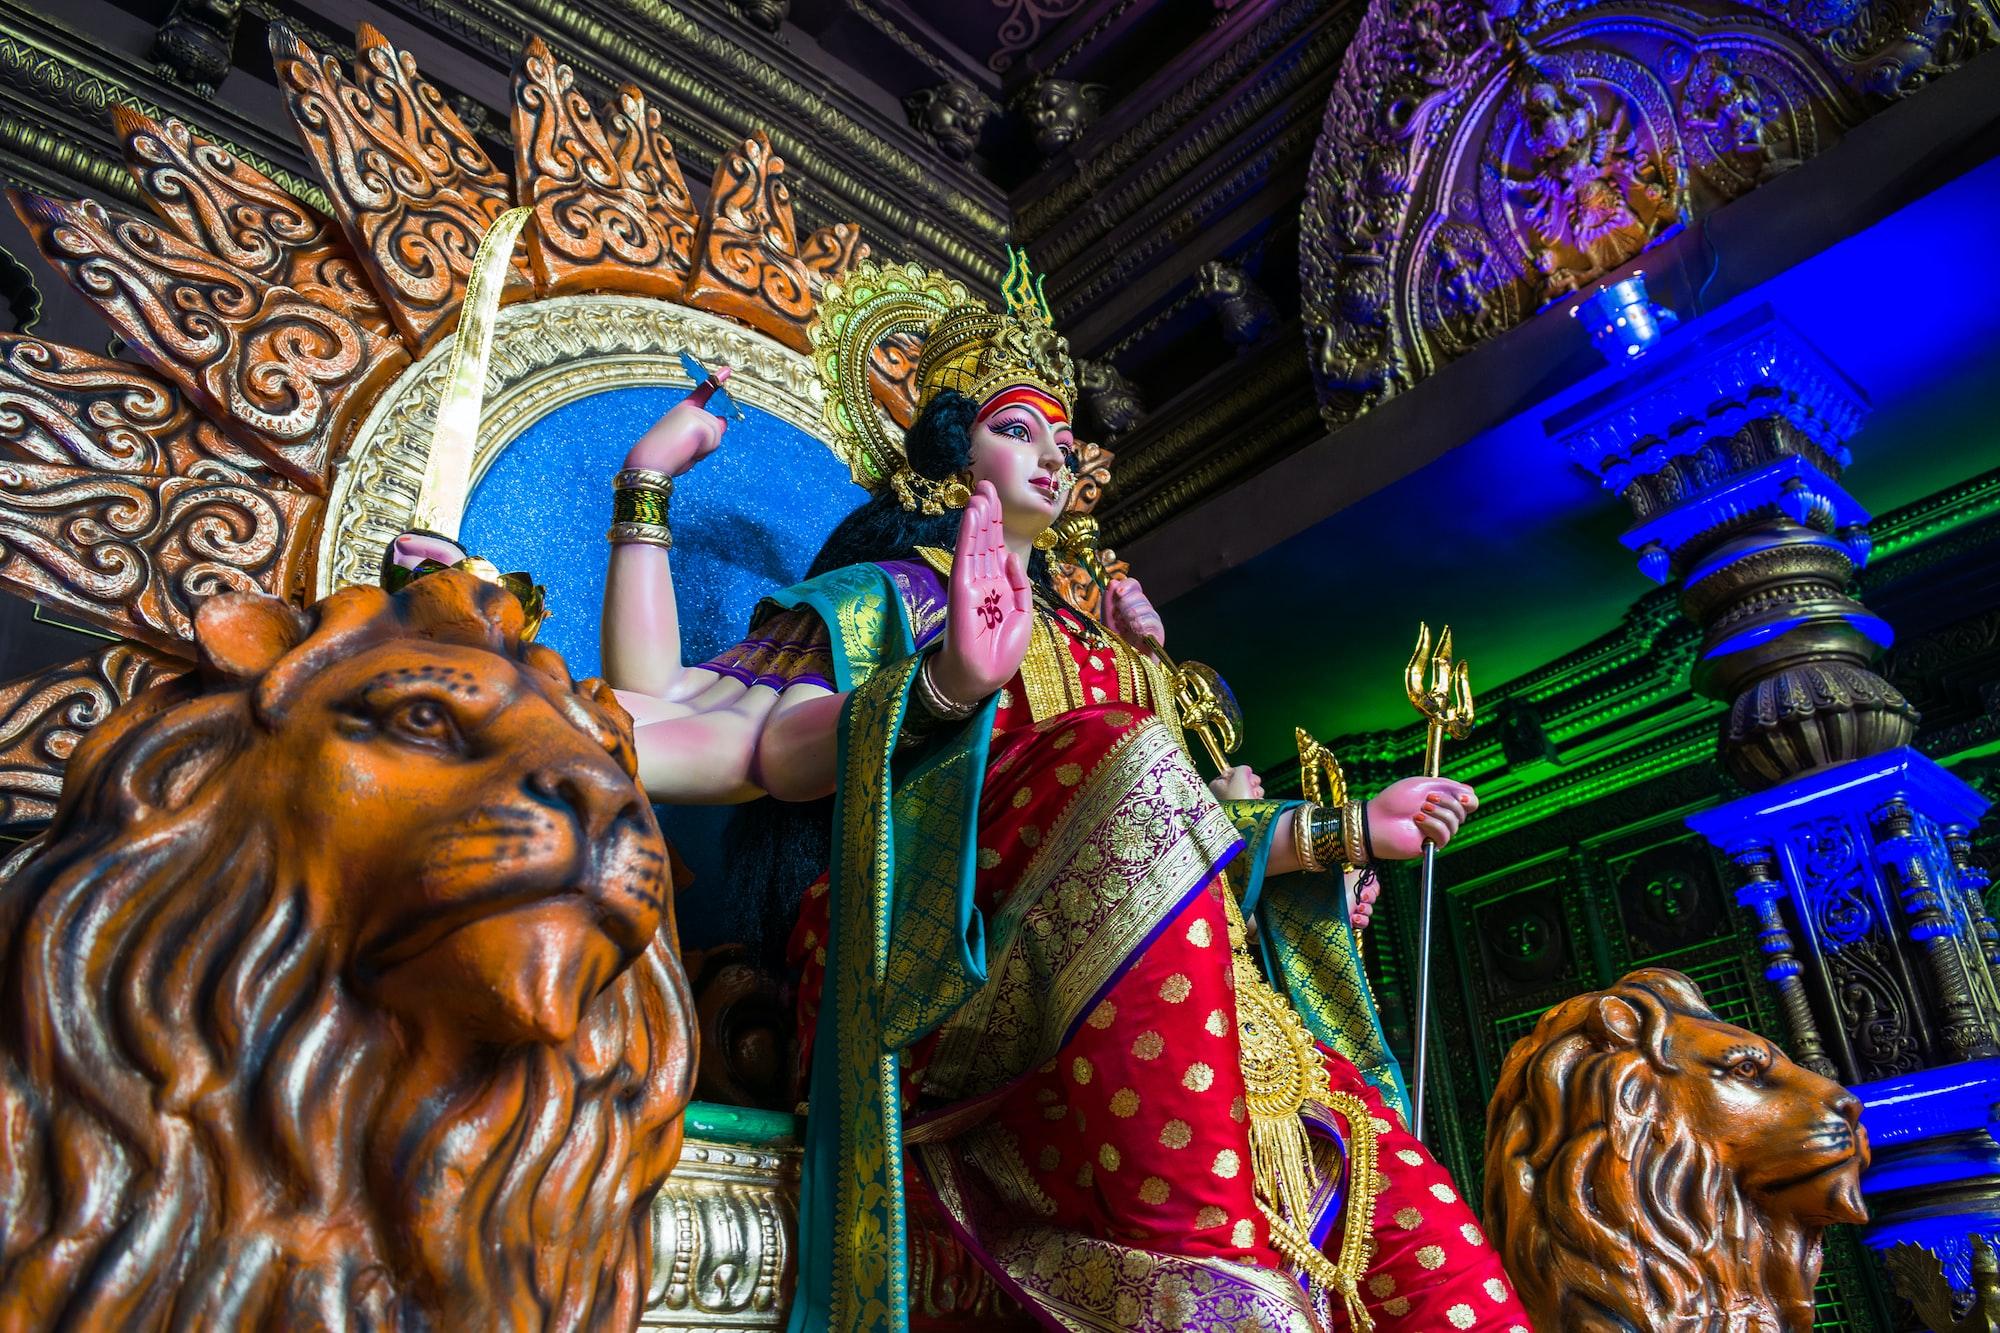 A Durga Devi temple in Mumbai, India during the festival of Navratri in 2019